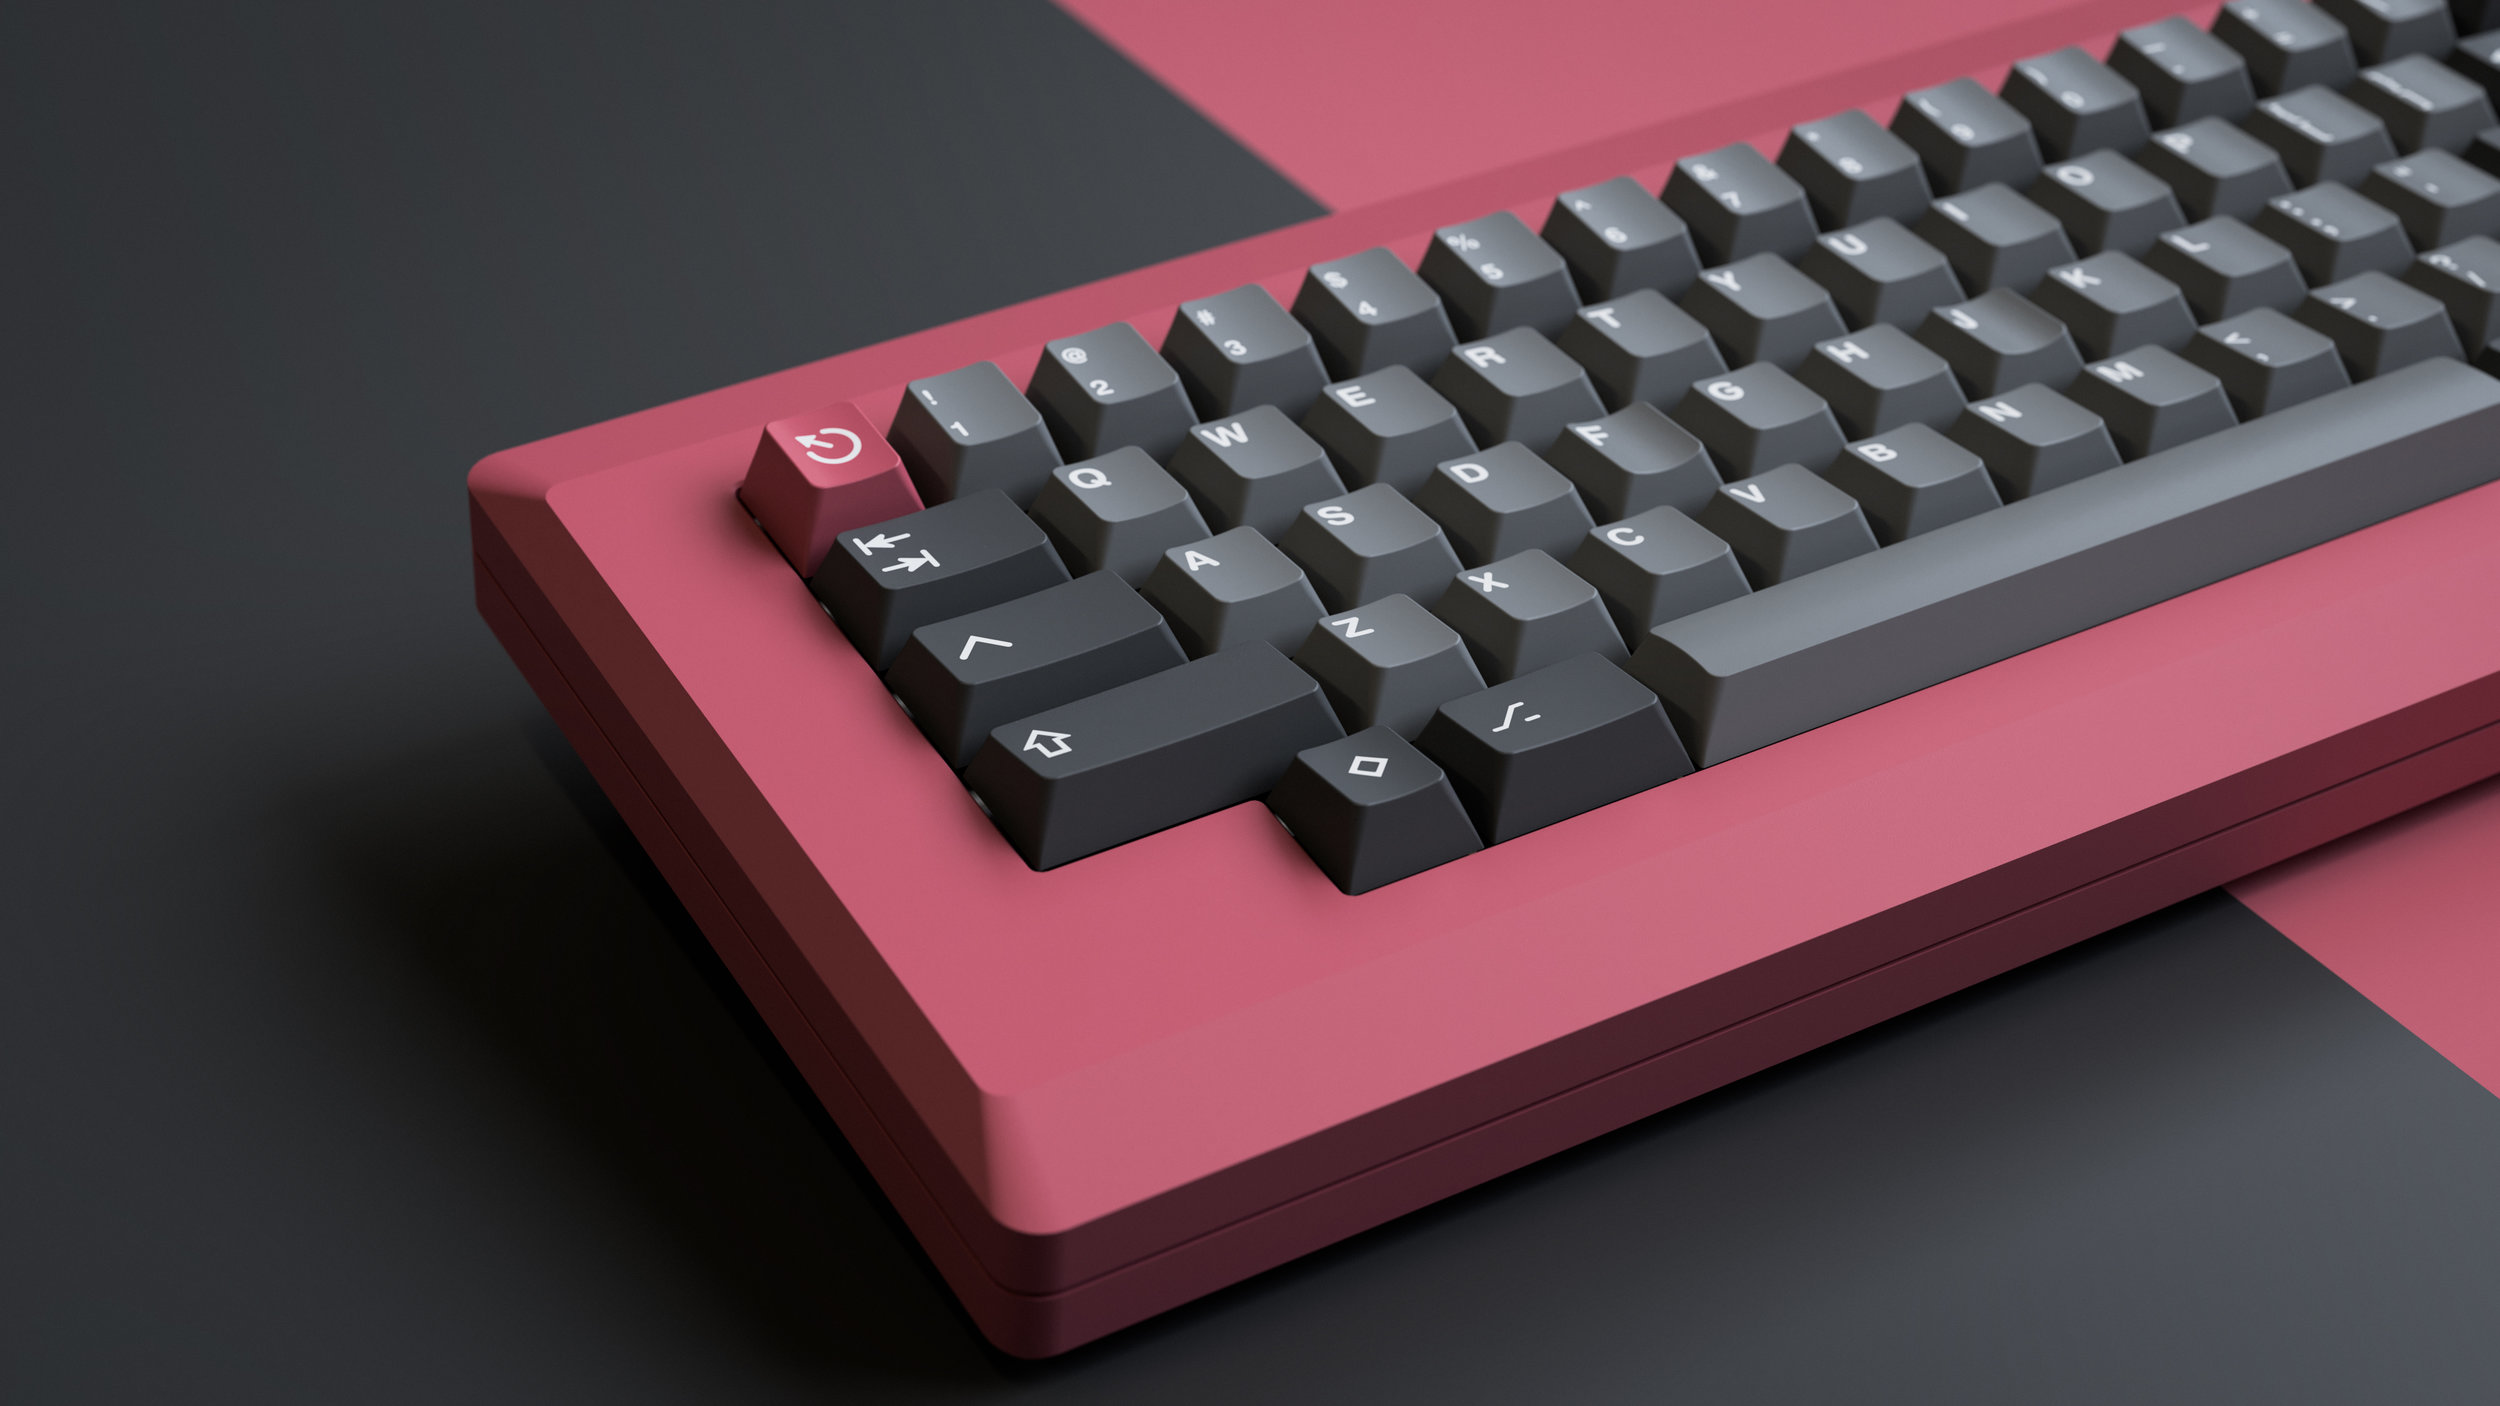 Modern M0110 by Clavier and Deskcandy